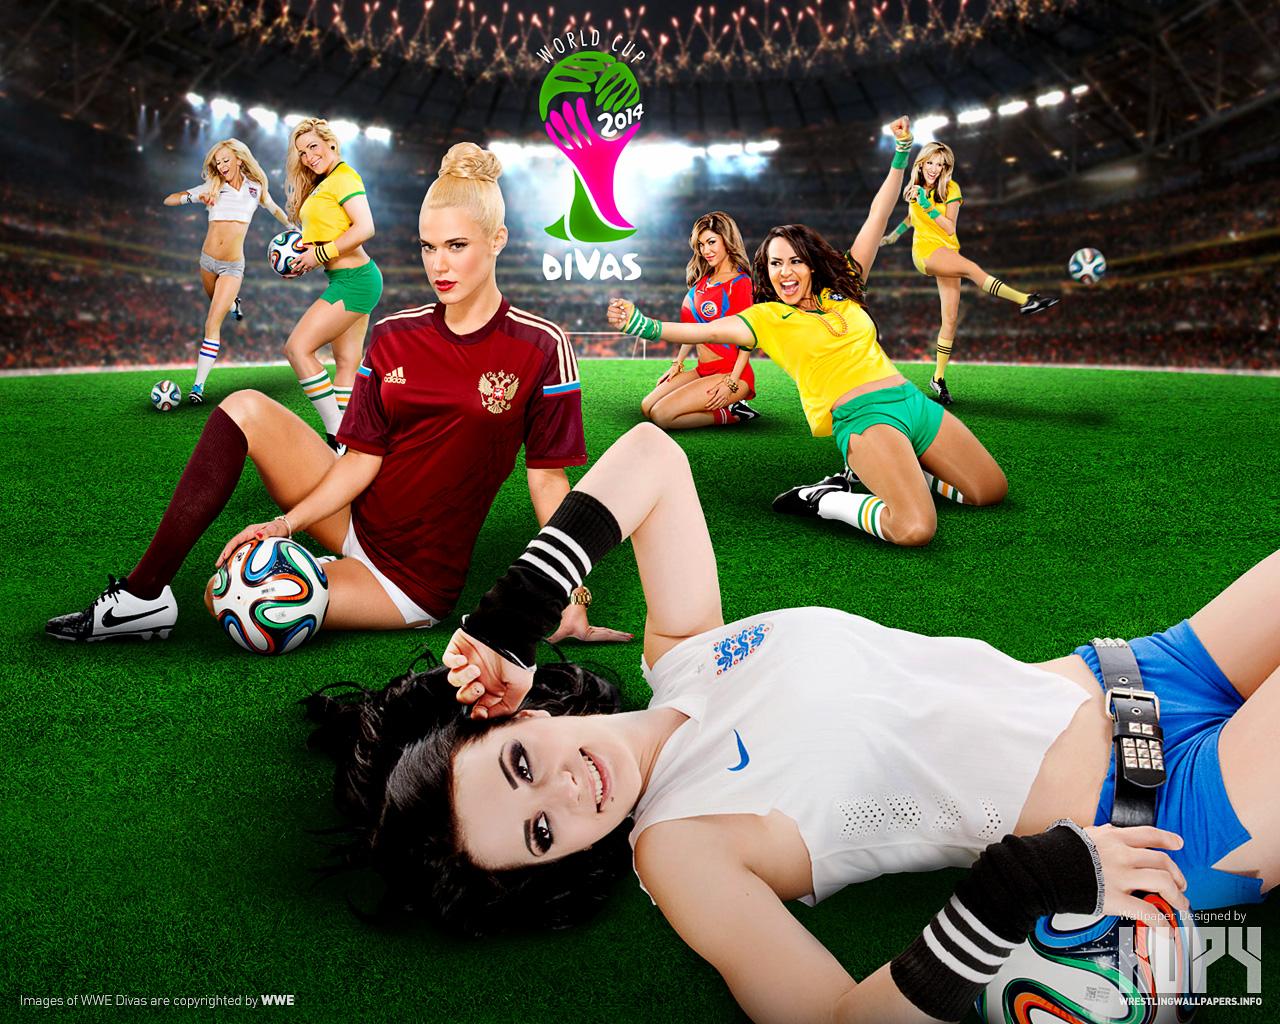 World Cup 2014 Divas